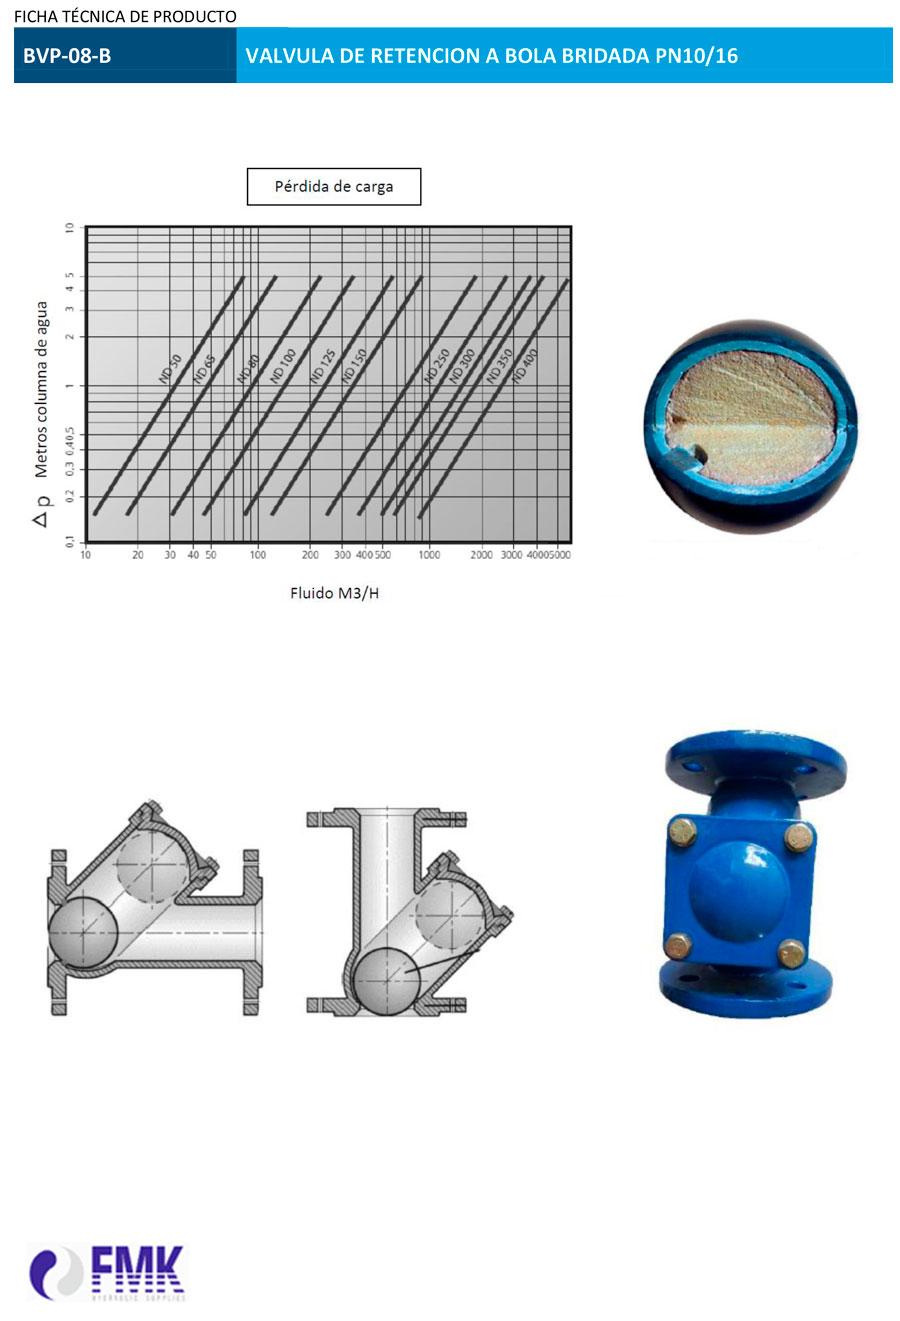 fmk-hydraulic-valvula-de-retencion-a-bola-bridada-BVP-08-B-ficha-tecnica-3